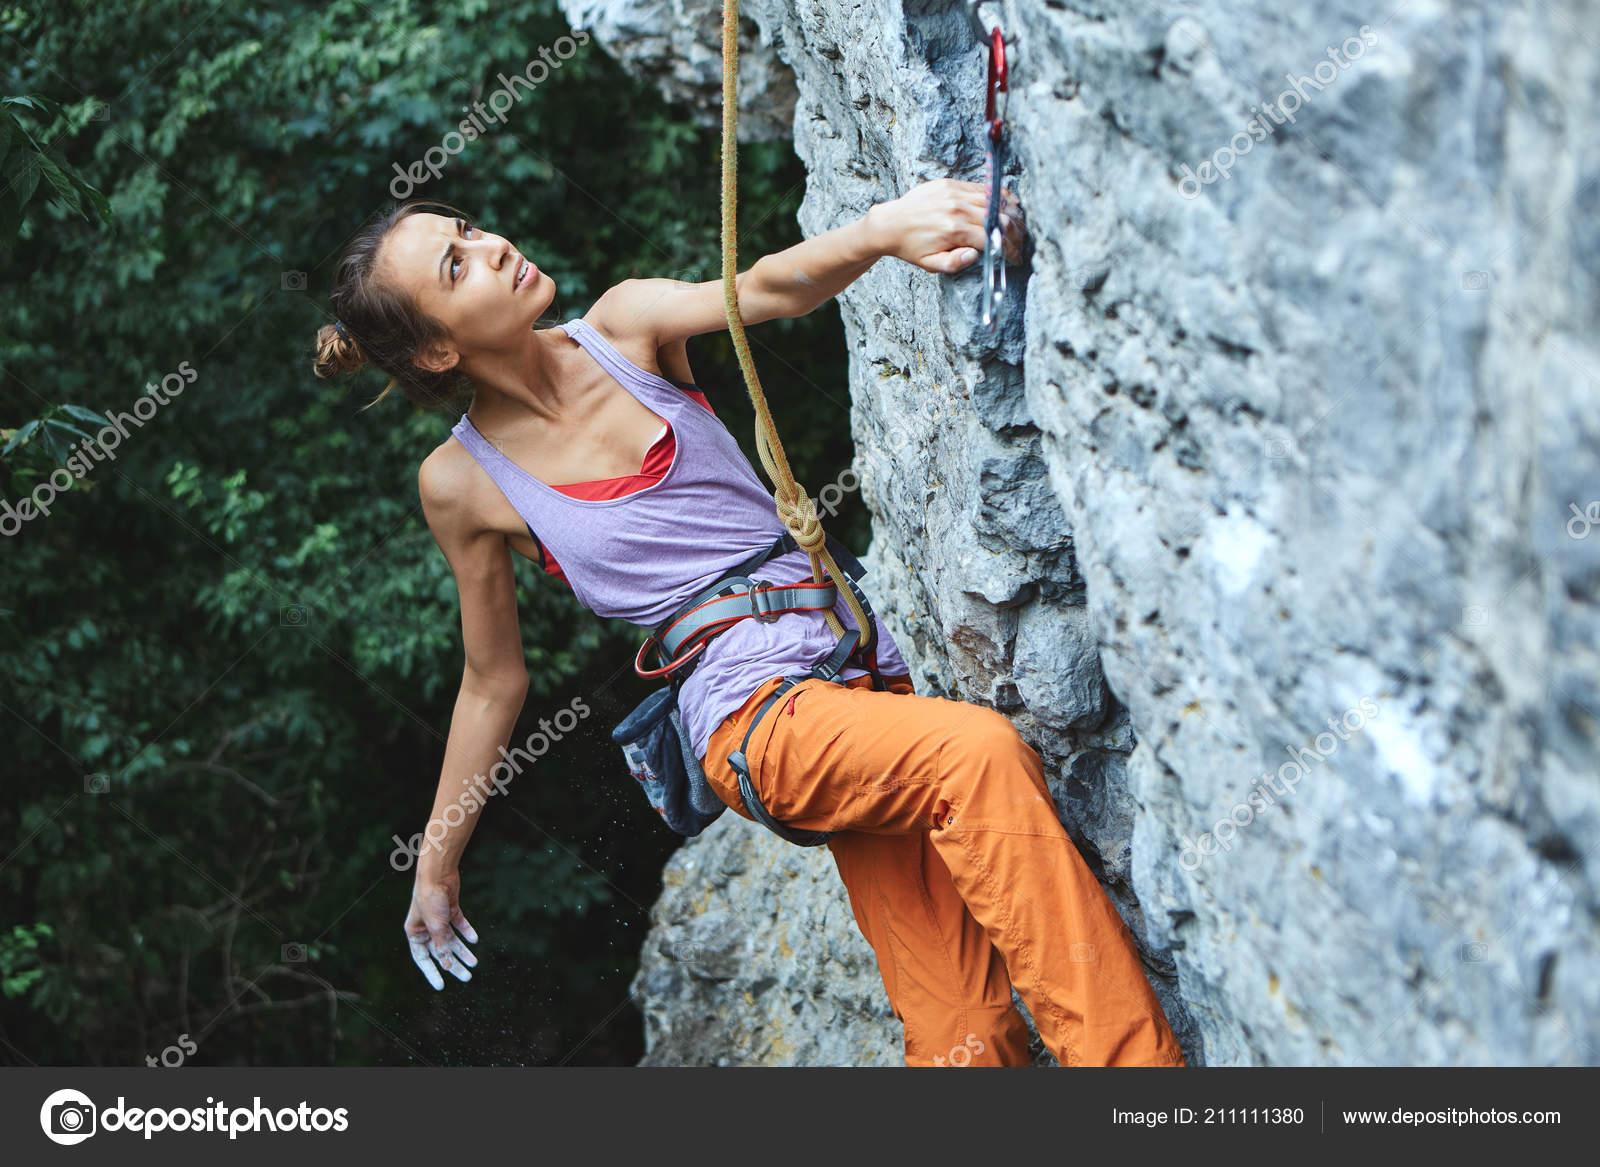 0892497f4dc508 Junge schlanke Frau Kletterer Klettern auf der Klippe — Stockfoto ...